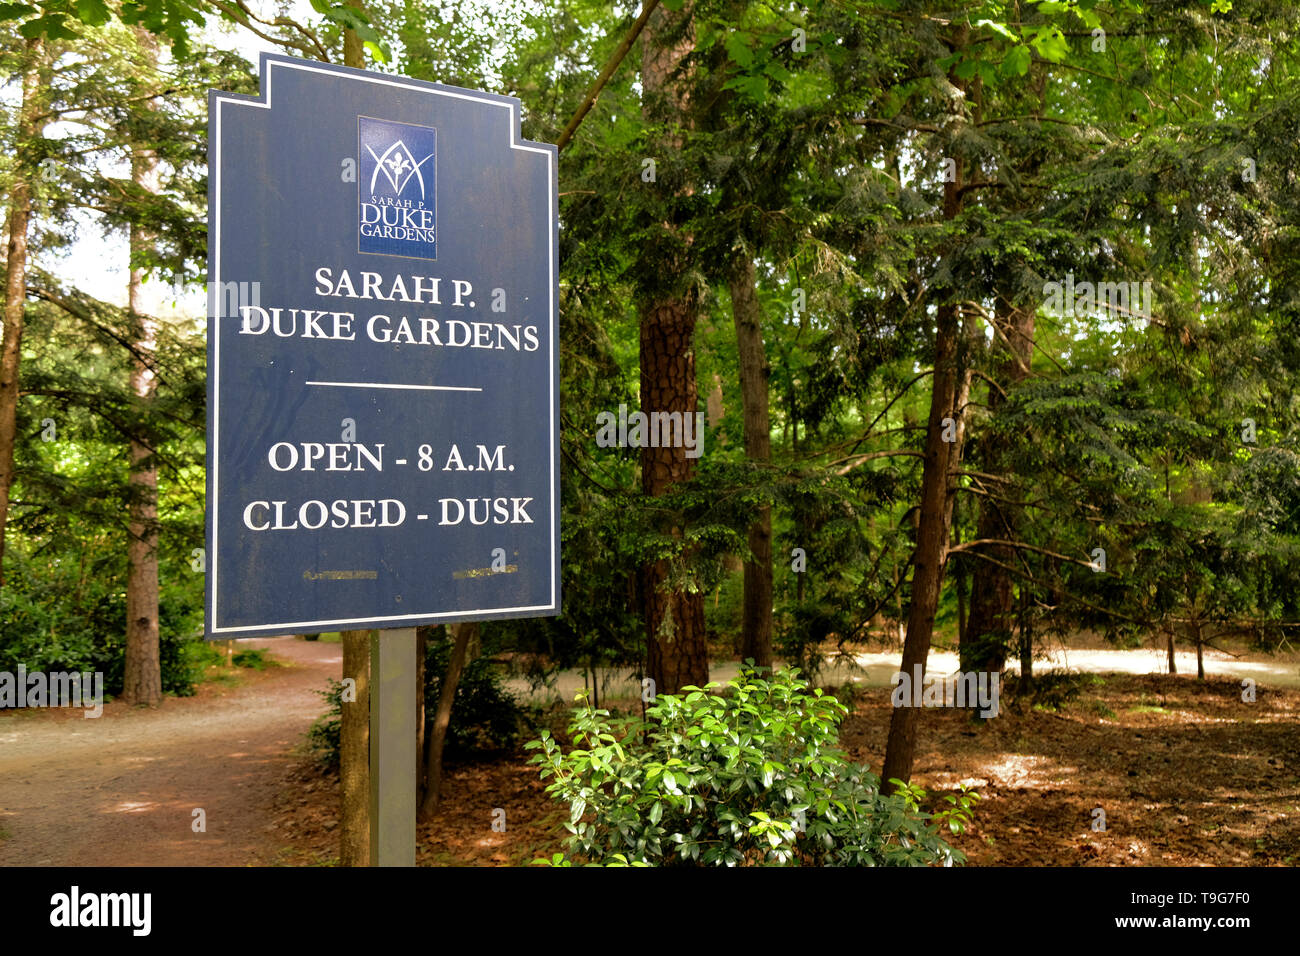 Sign at the Sarah P. Duke Gardens on the campus of Duke University in Durham, North Carolina, USA. Stock Photo